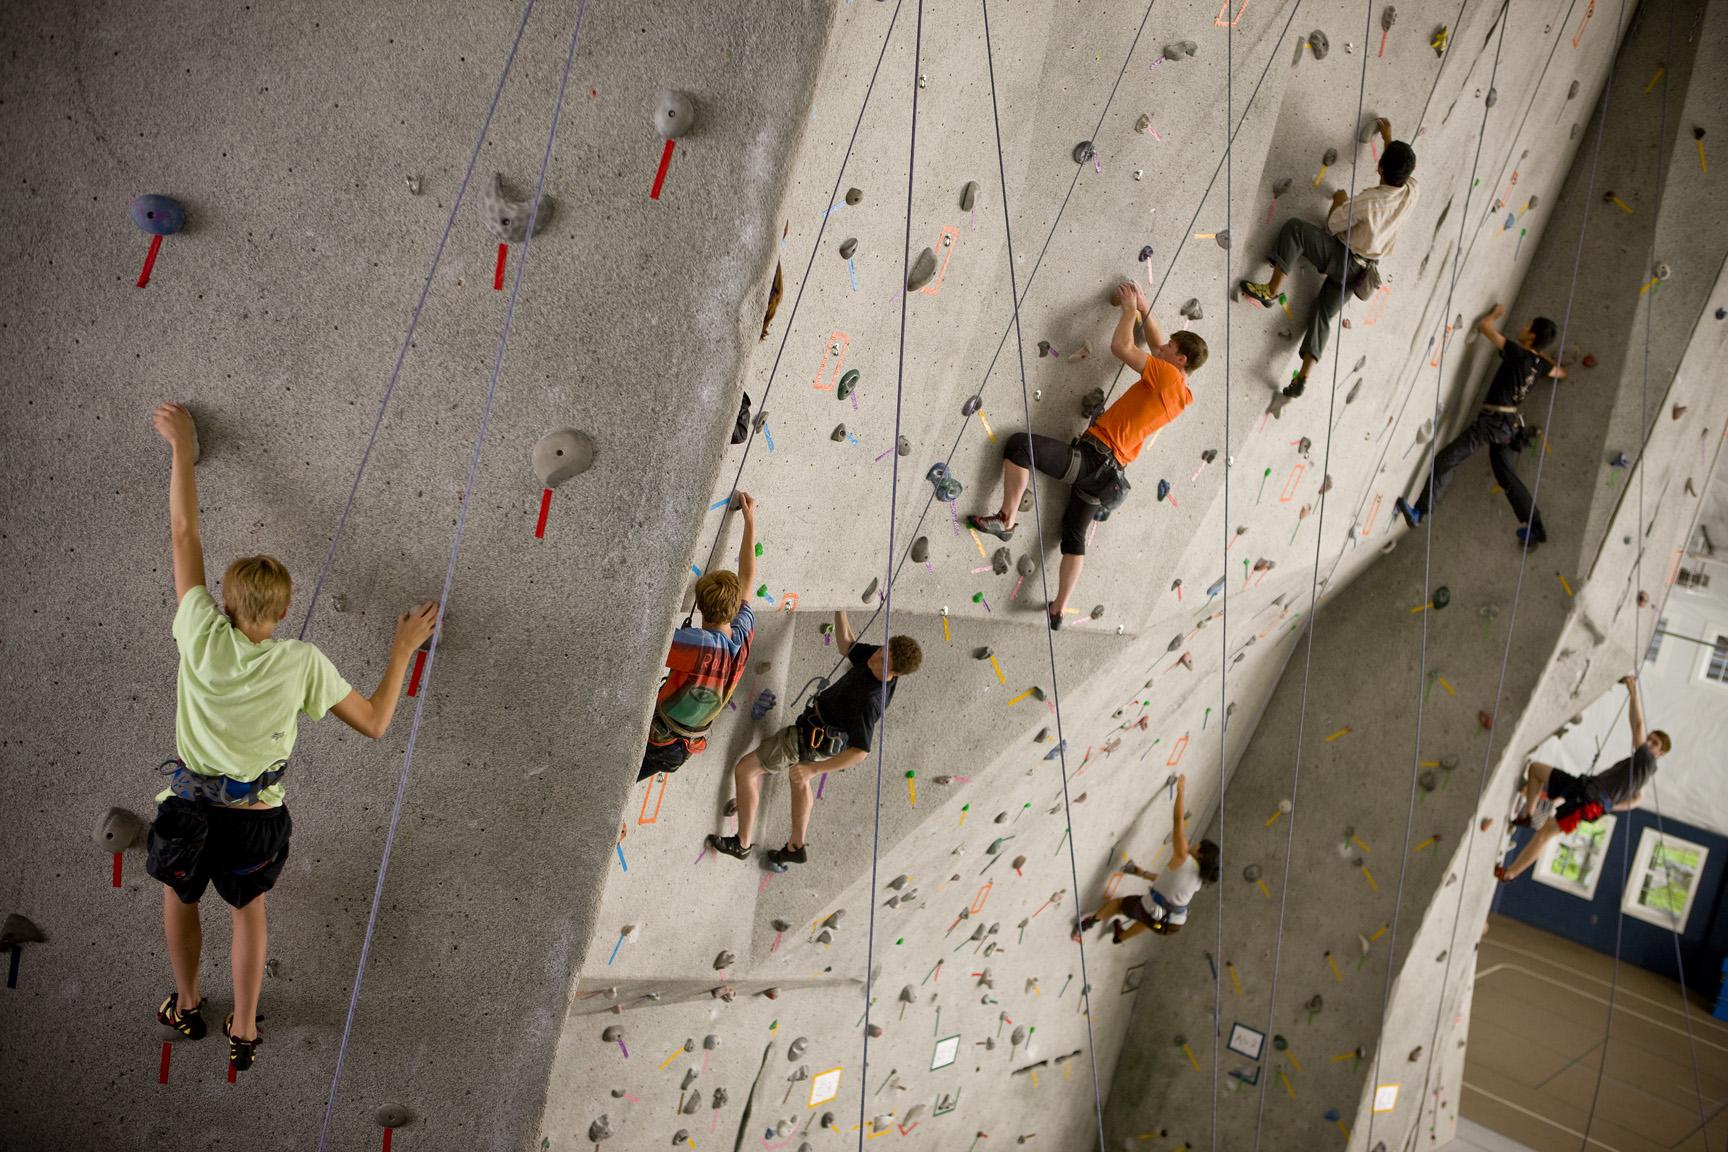 rock-climbing-image